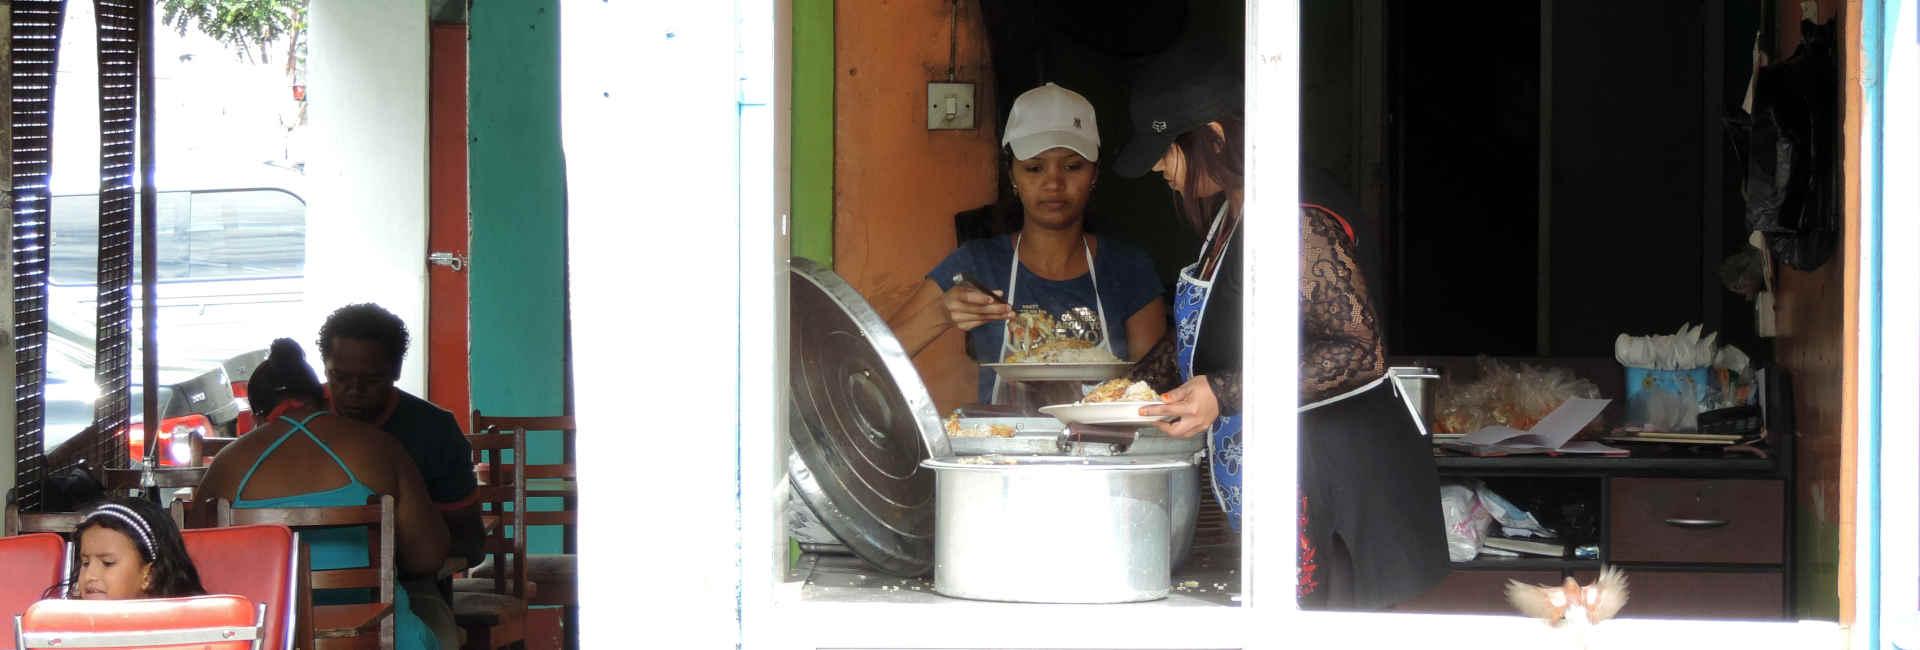 Typical village restaurant in Mauritius